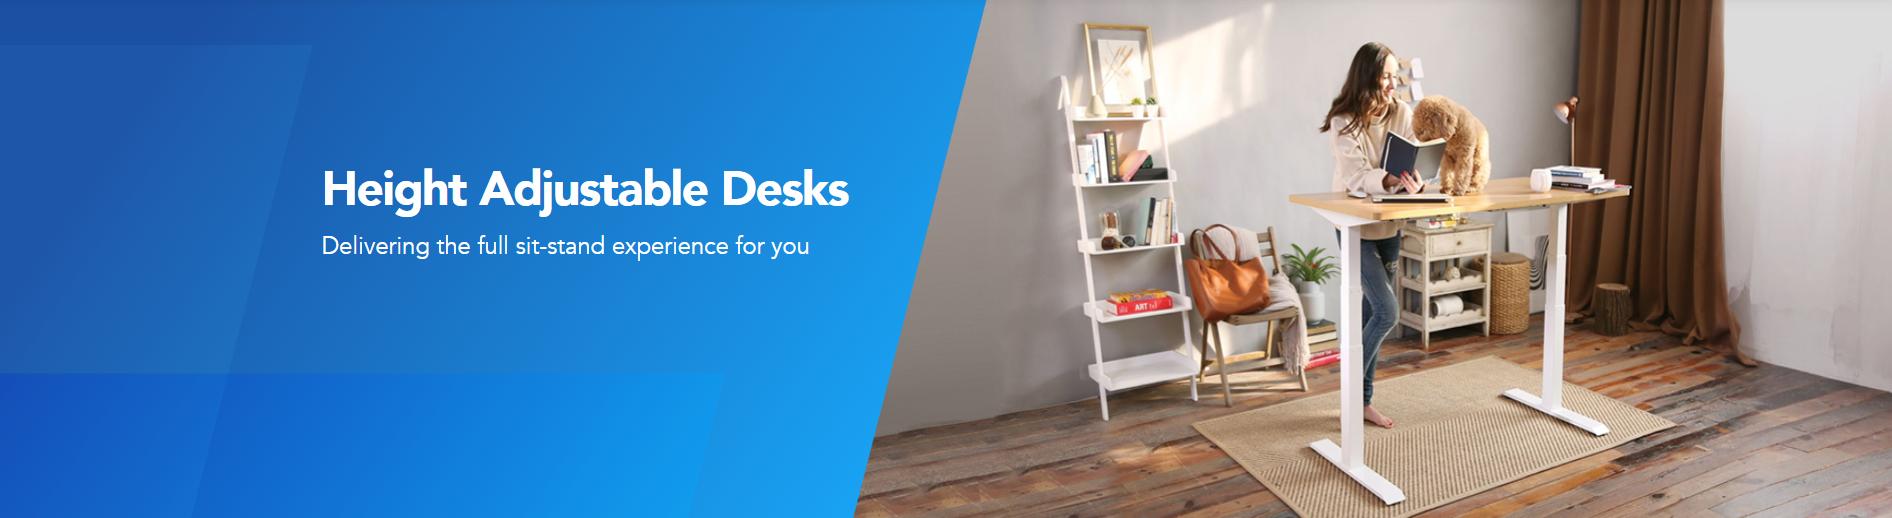 Mstar جلدية قوائم مكتب ، ذكي ارتفاع قابل للتعديل الذكية مكتب بأسعار معقولة اعتصام إلى قائم مكاتب